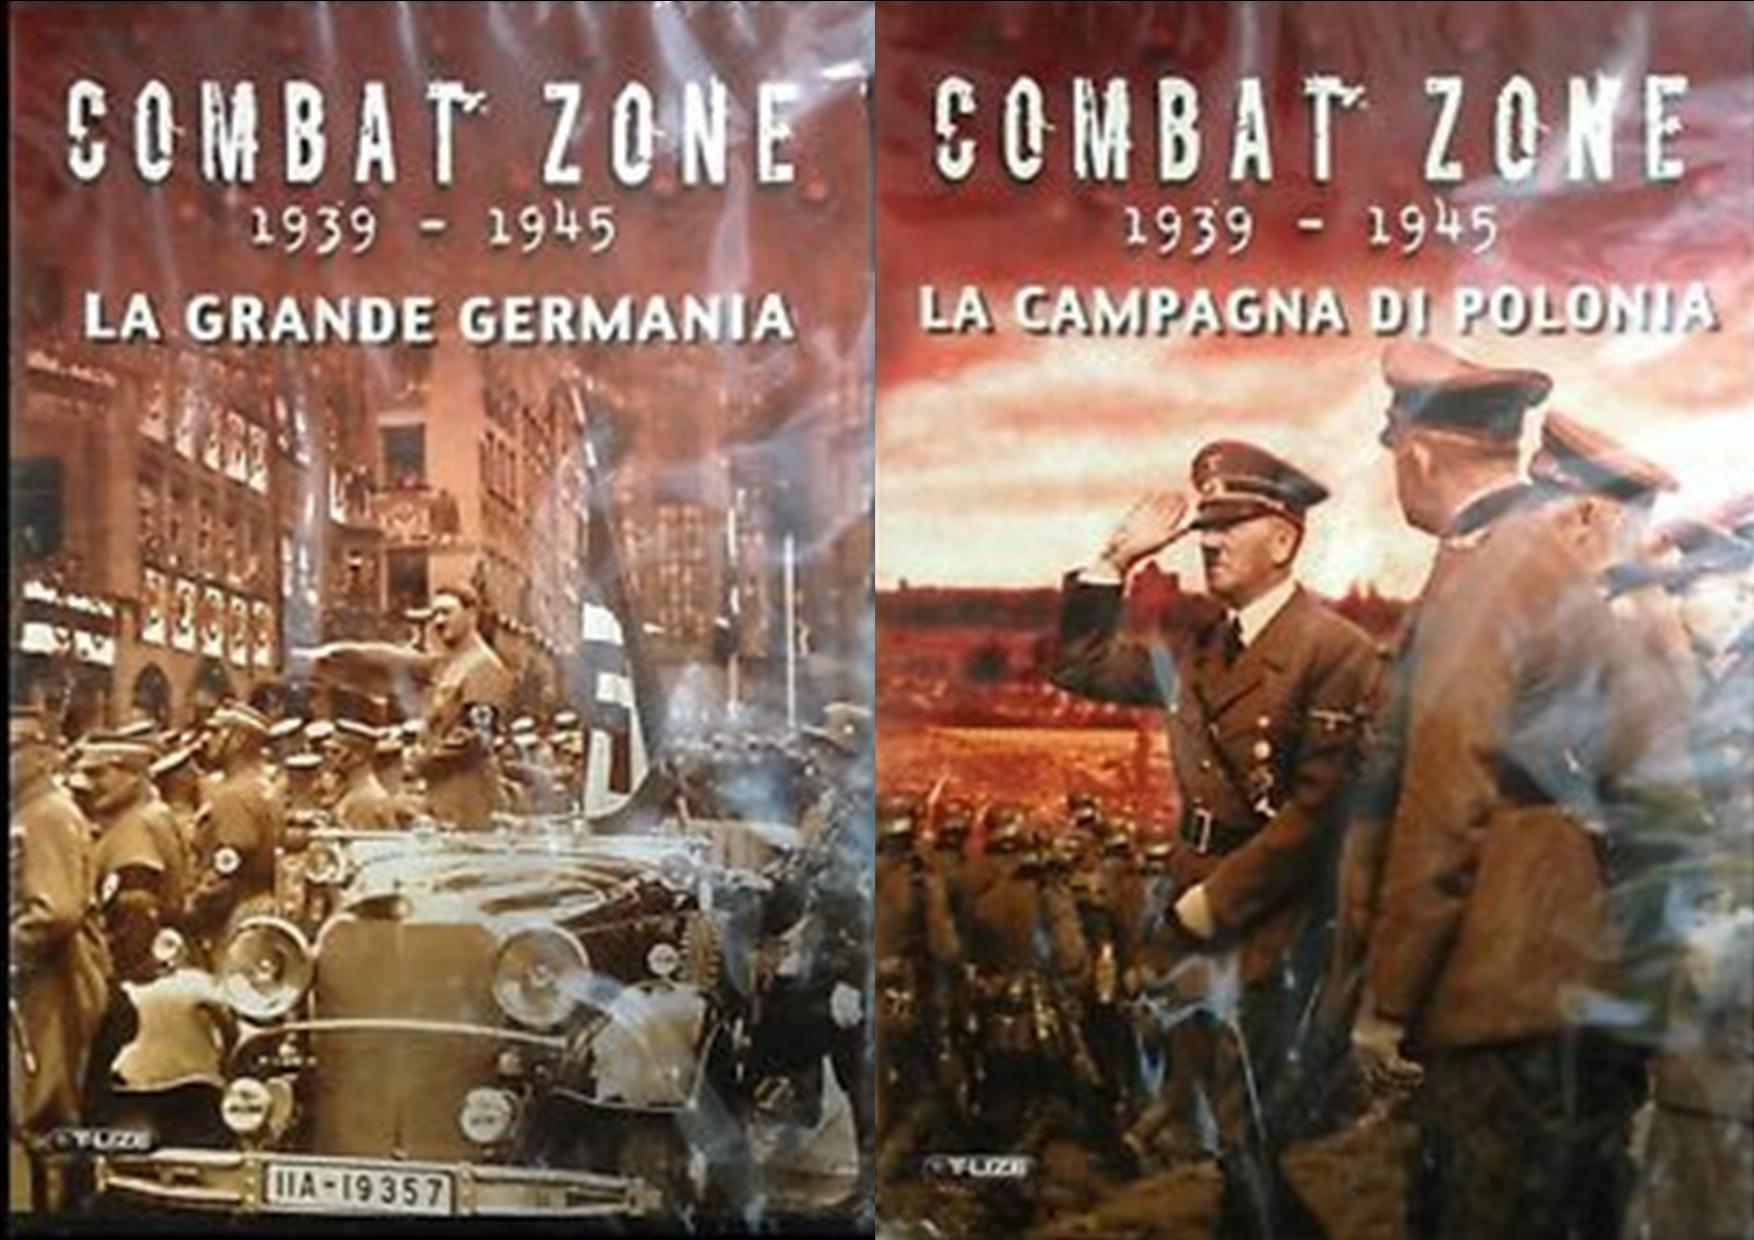 COF.COMBAT ZONE 1939-1945 (2 DVD) (DVD)